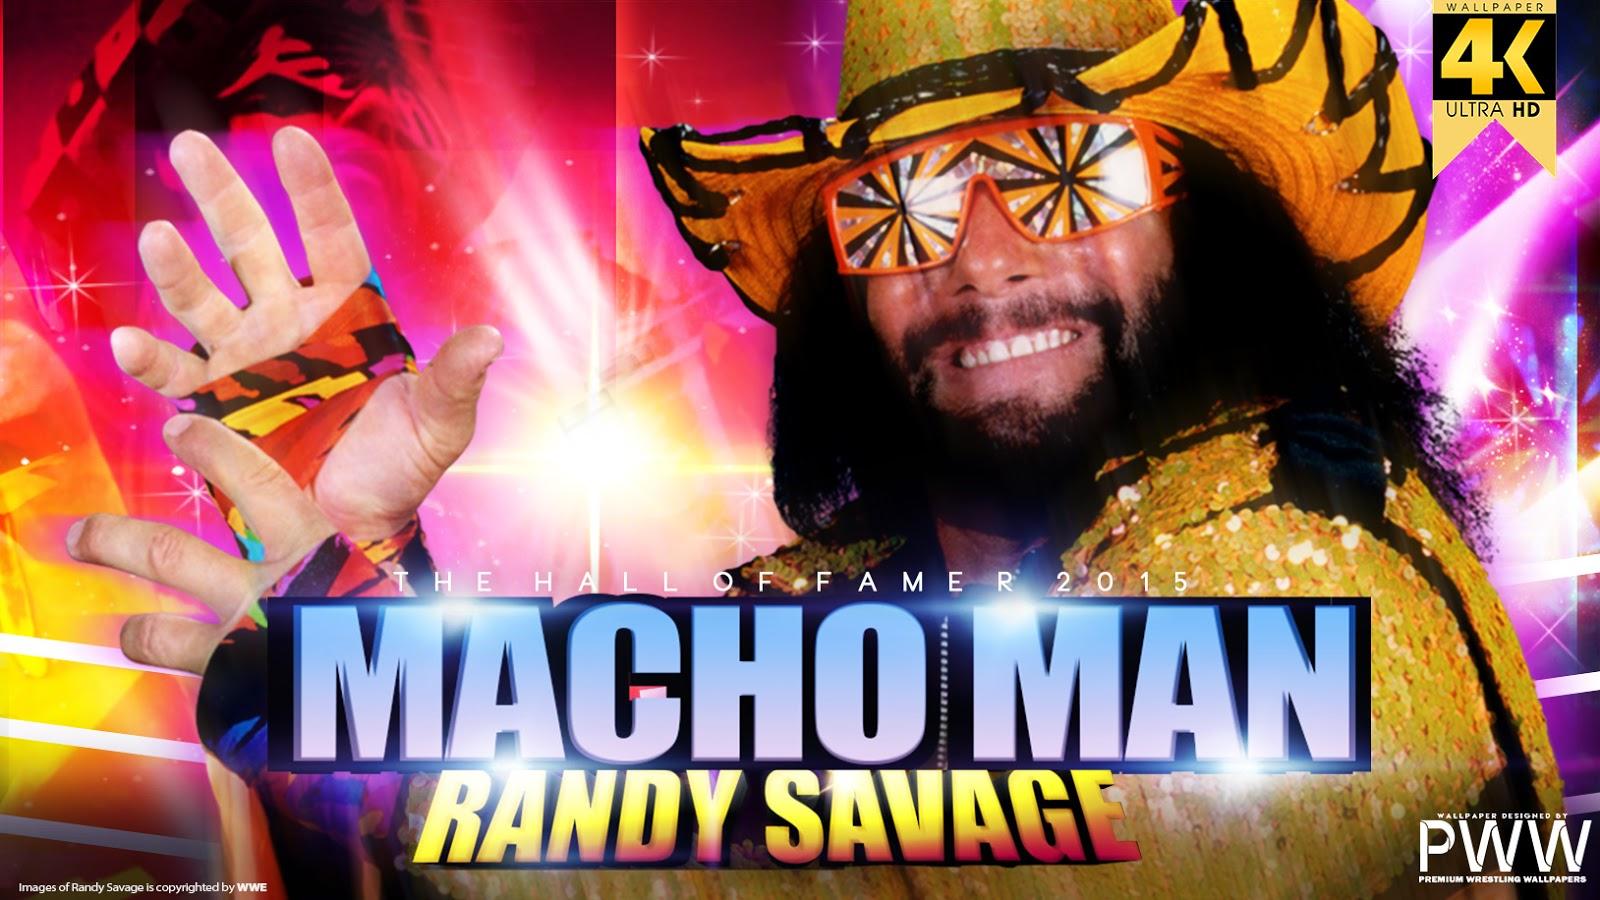 Image Result For Macho Man Randy Savage Wallpaper Hd Wallpaper